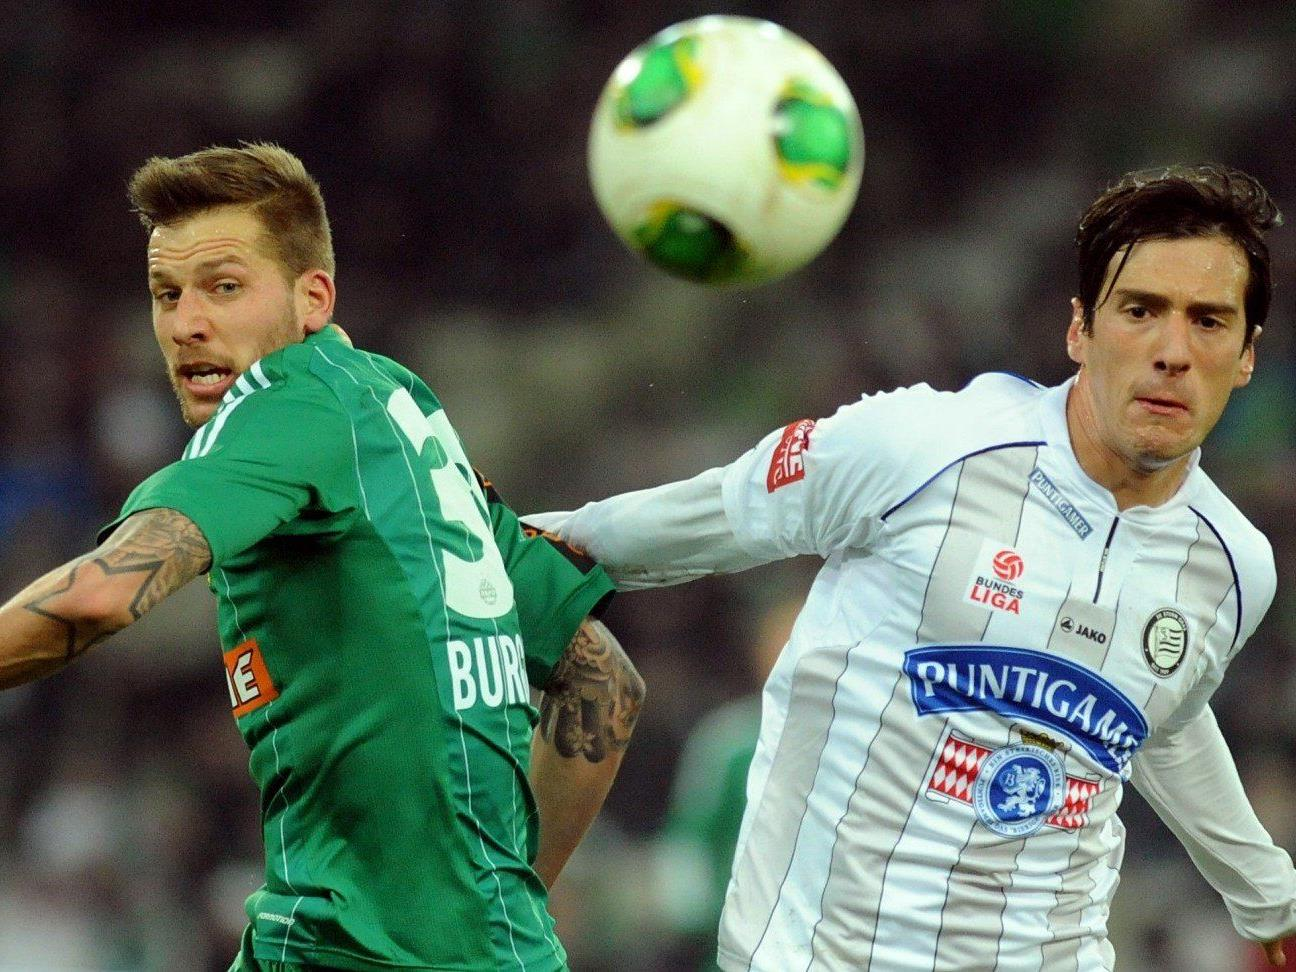 Wir berichten live vom Spiel SK Sturm Graz gegen SK Rapid Wien im Live-Ticker.